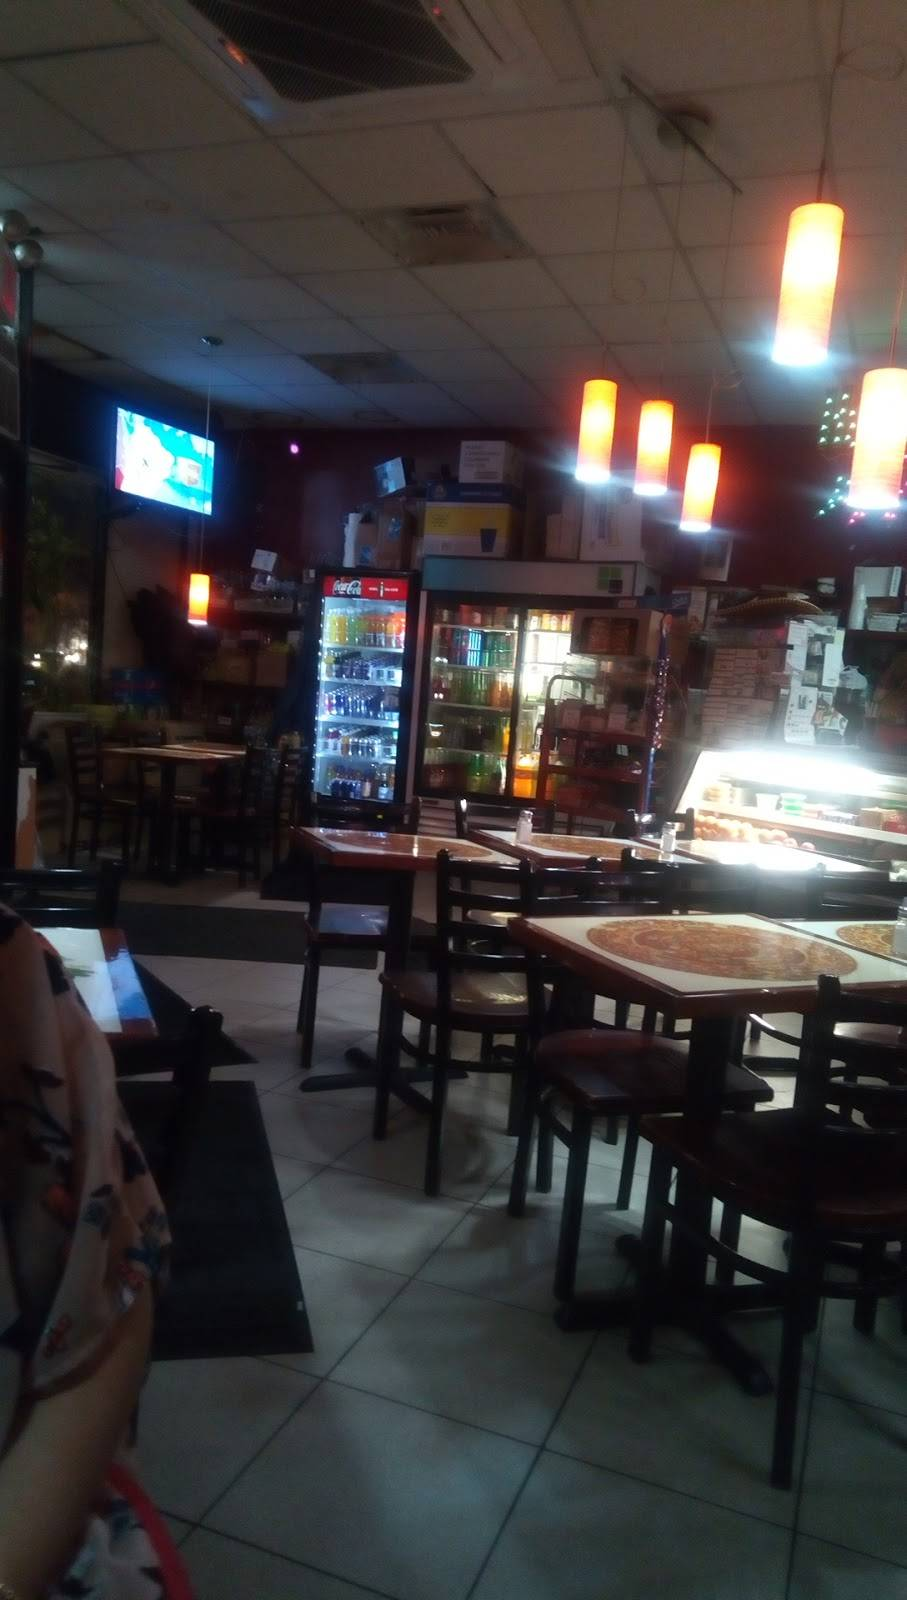 Tulcimex Restaurant & Rental Party Space   restaurant   2559 Boston Rd, Bronx, NY 10467, USA   3478437997 OR +1 347-843-7997